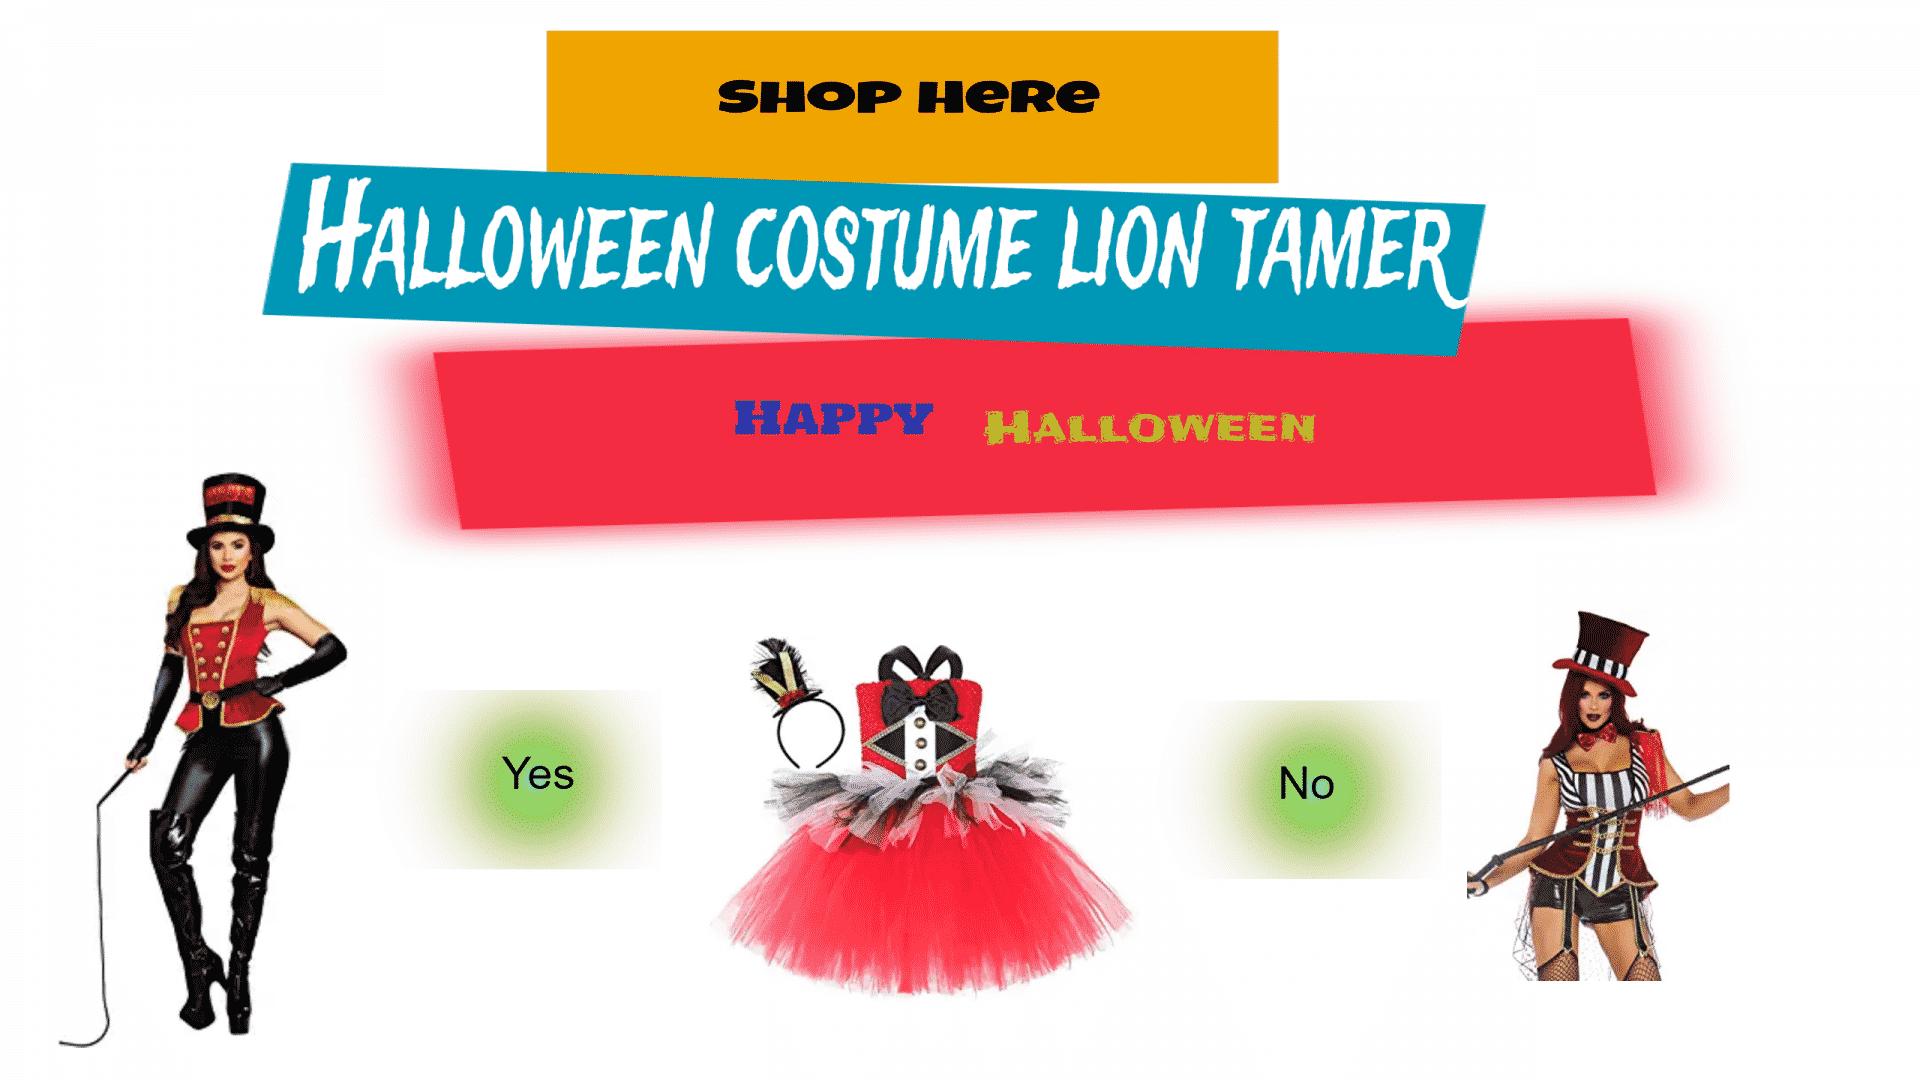 Halloween costume lion tamer